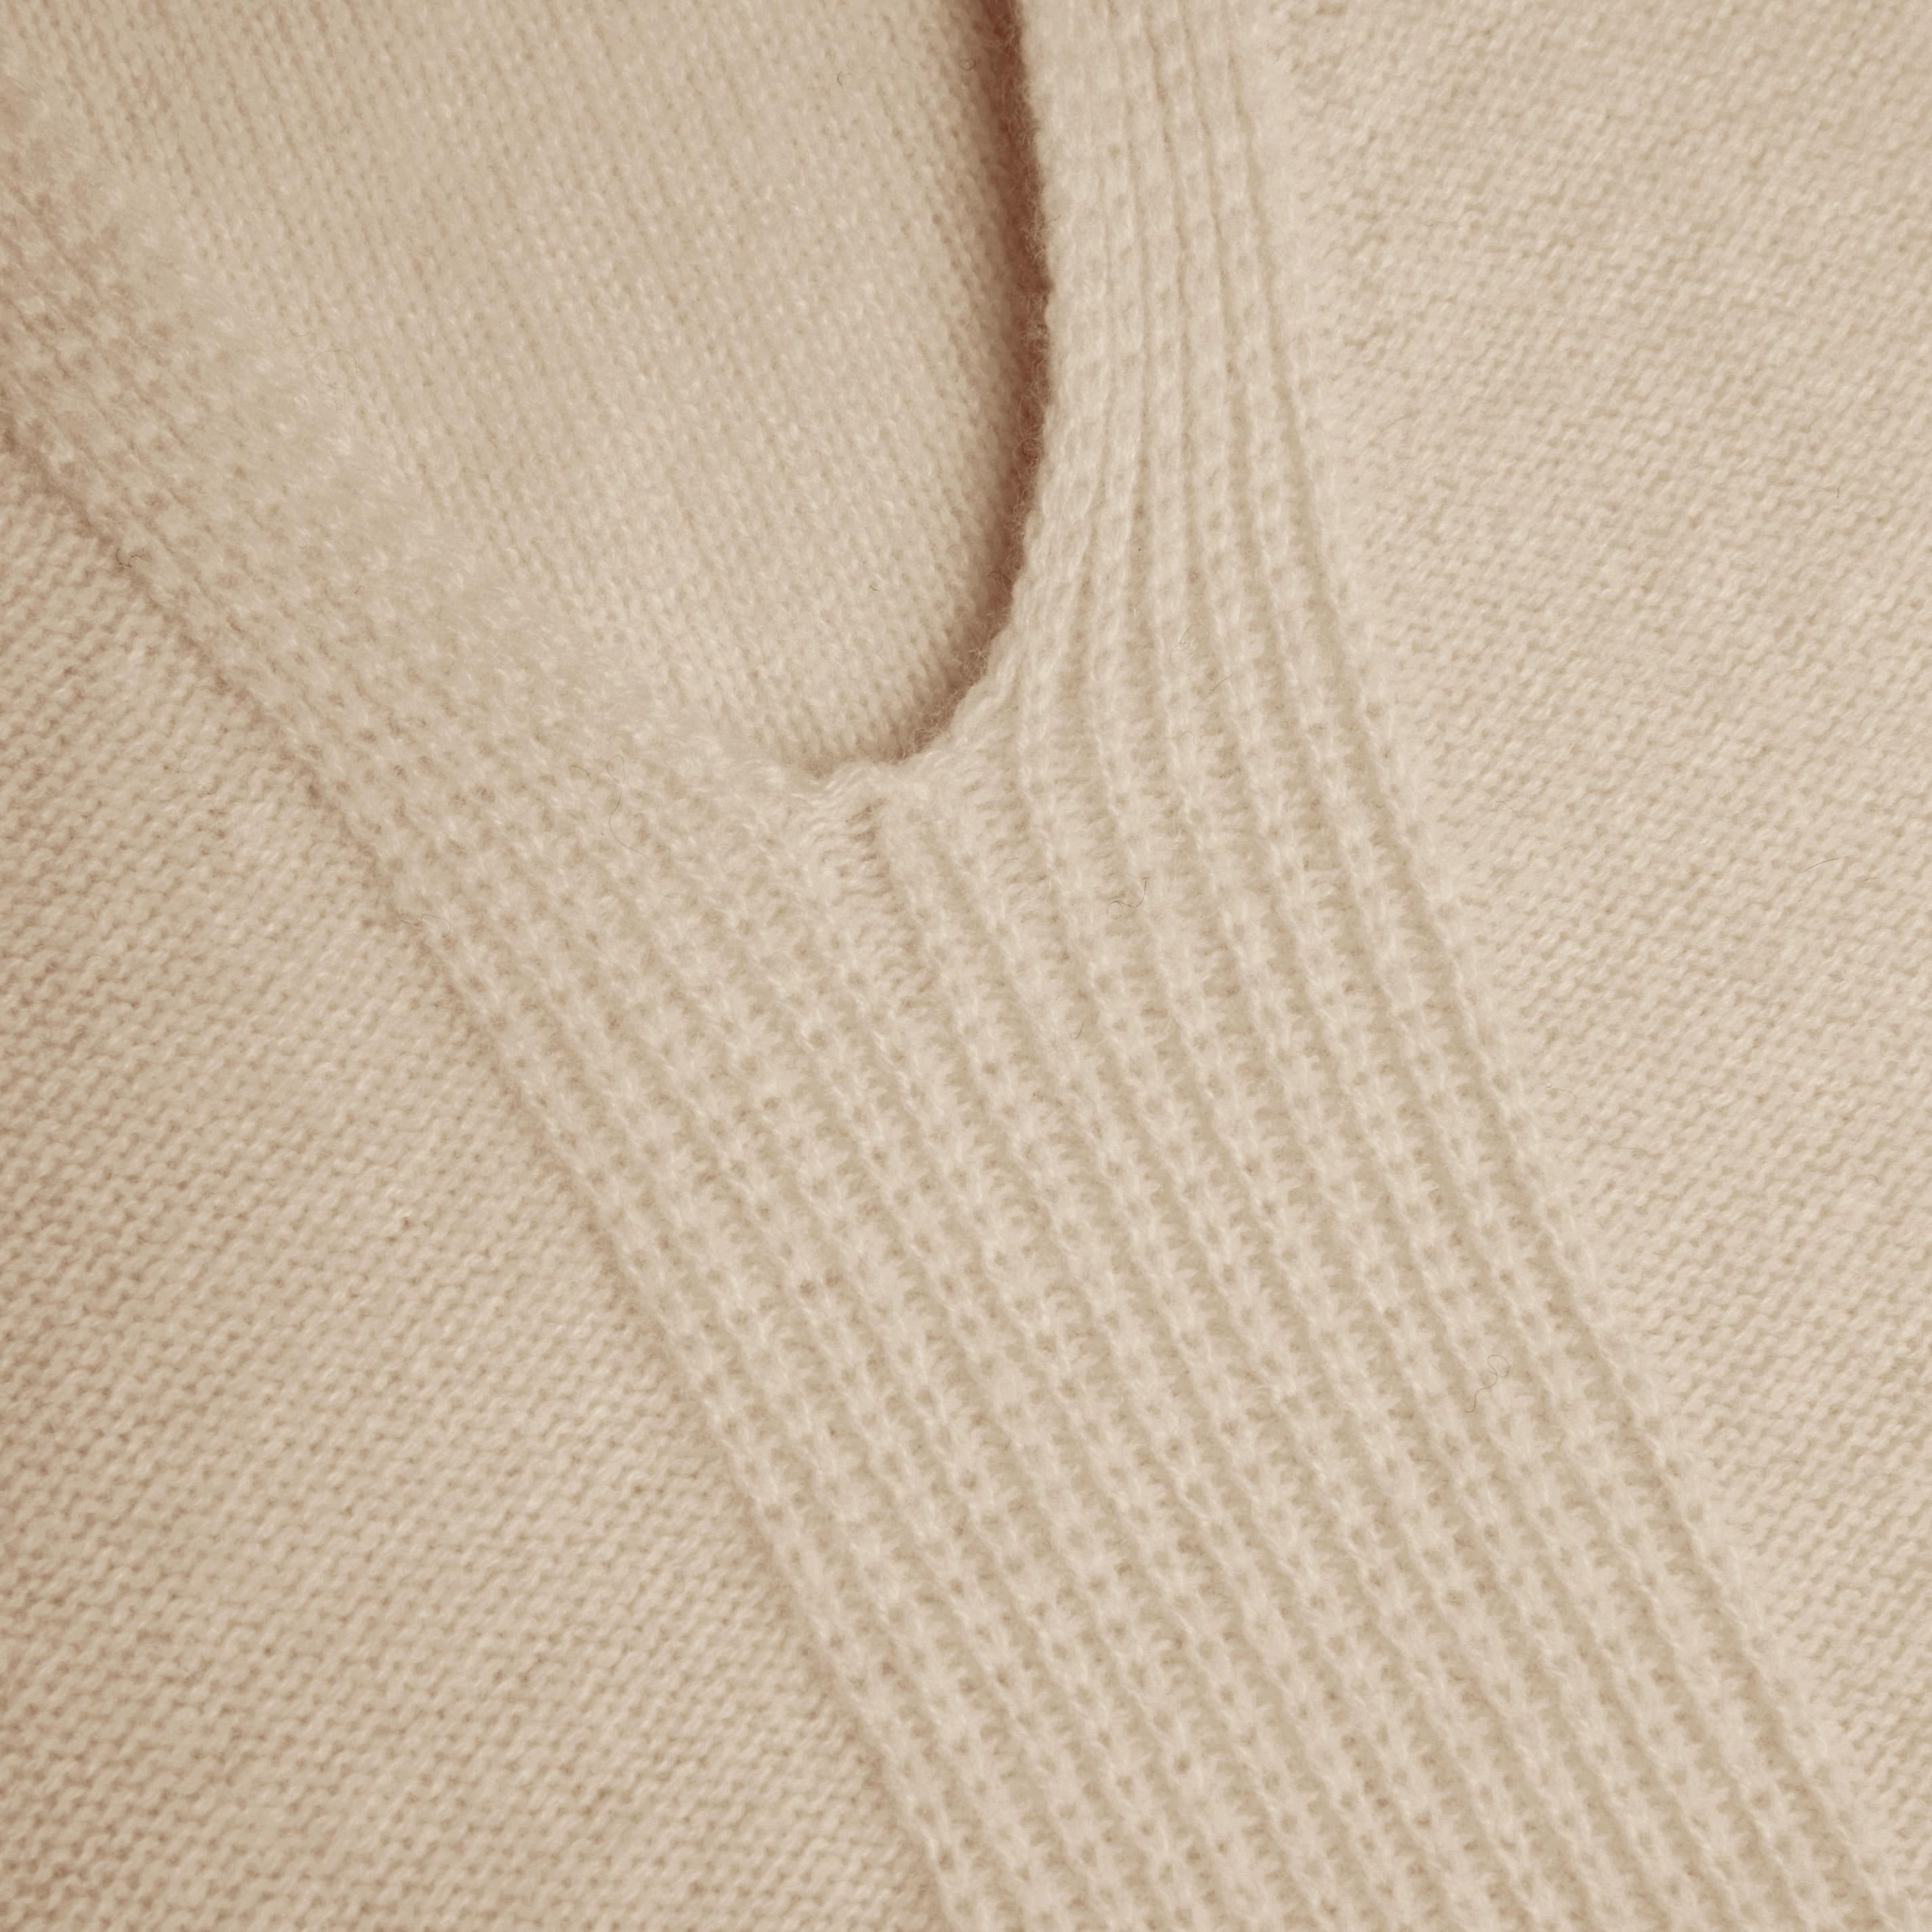 Cashmere Vest-Cream Ivory - Cream Ivory S